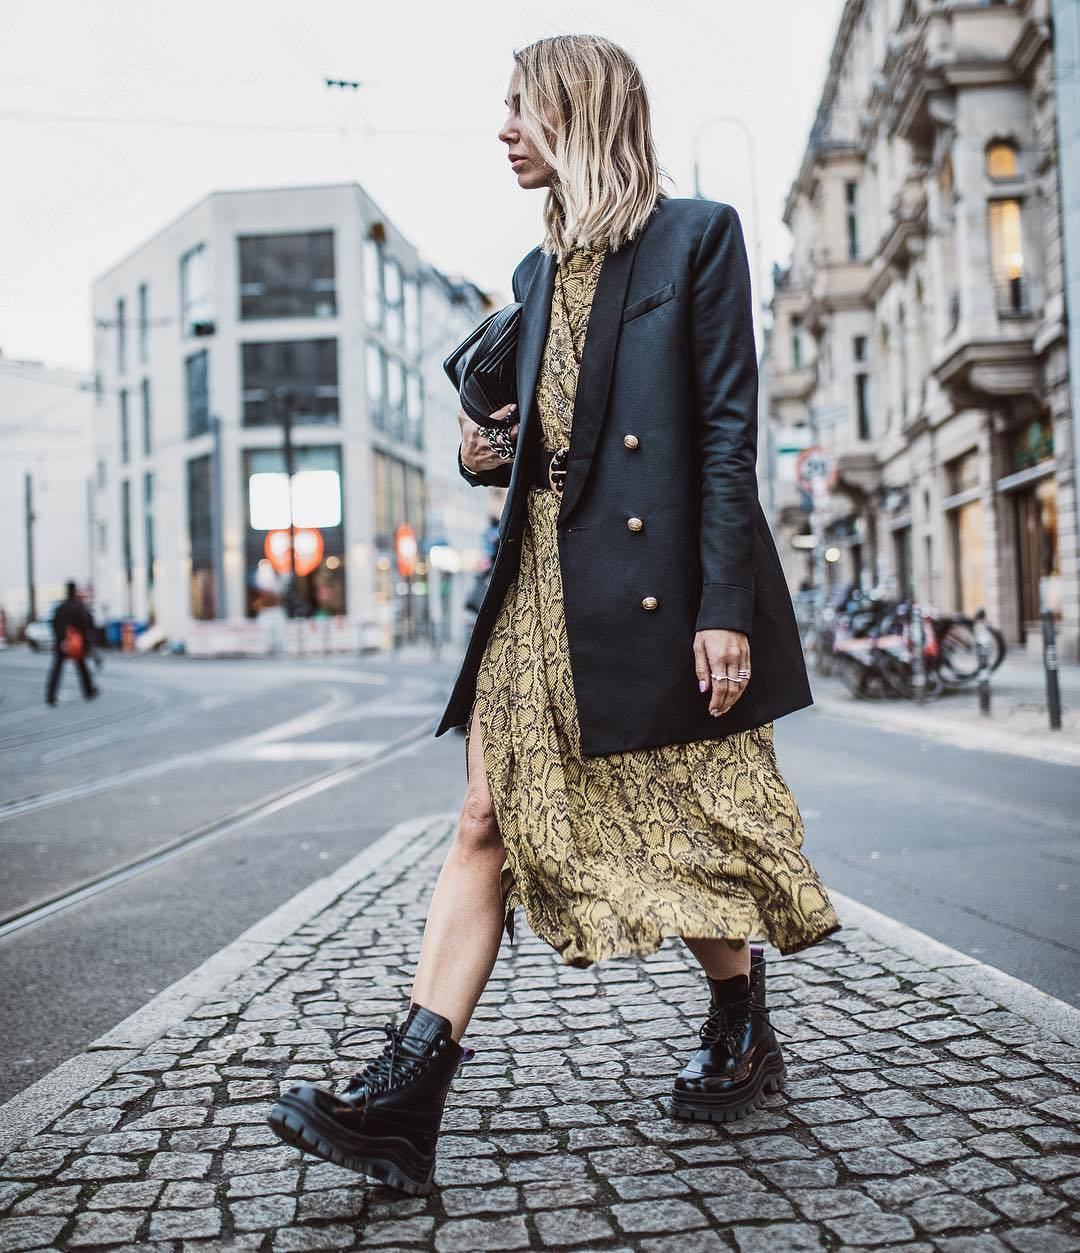 shoes black boots lace up boots snake print midi dress black coat double breasted black belt black bag